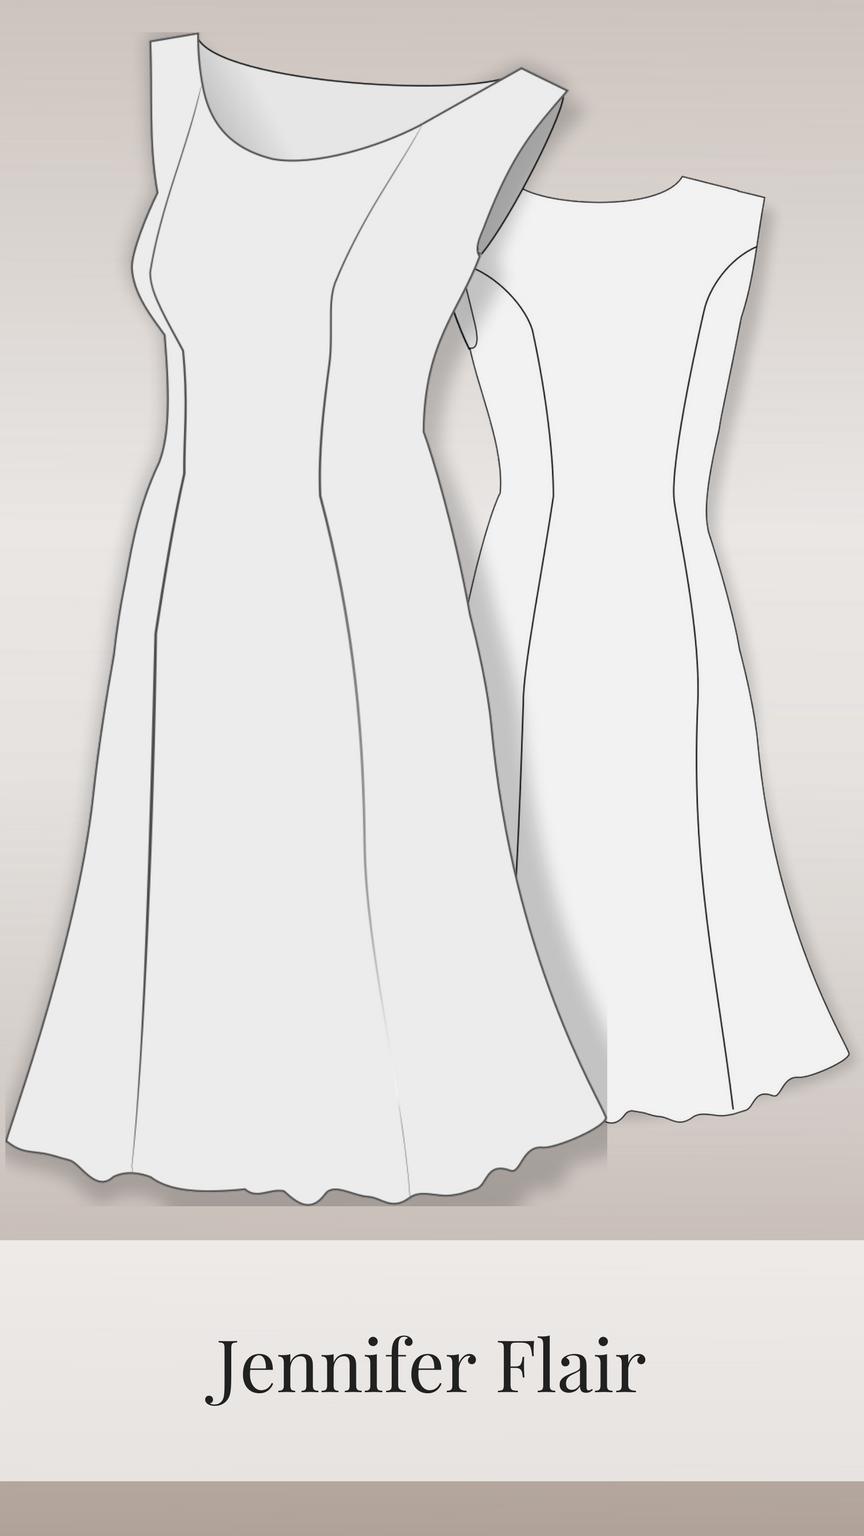 jennifer flair - kleid 34-48 | kleidung, schnittmuster kleid